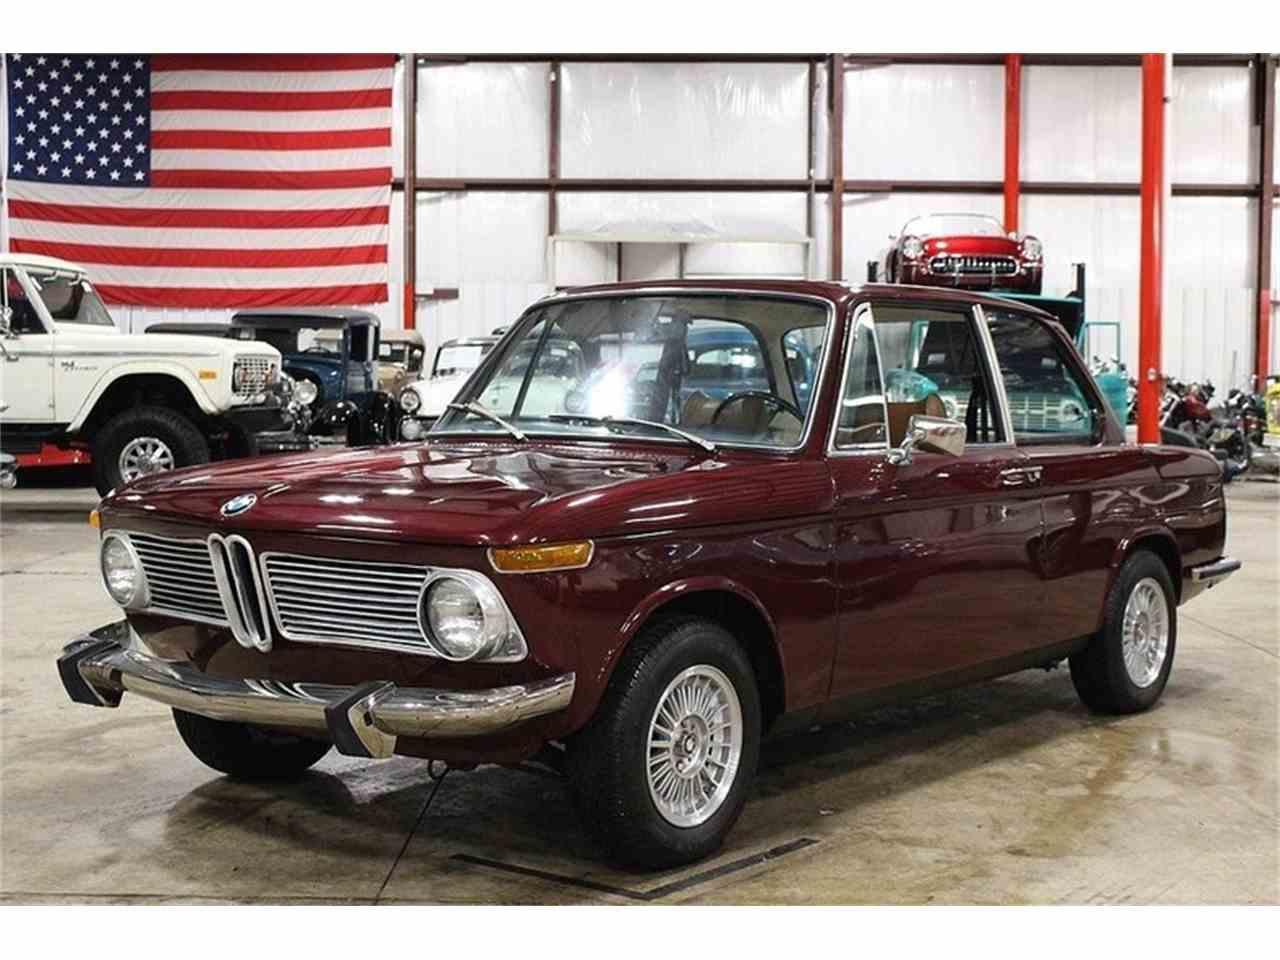 Bmw 2002 Sale >> 1973 Bmw 2002 For Sale Classiccars Com Cc 1058299